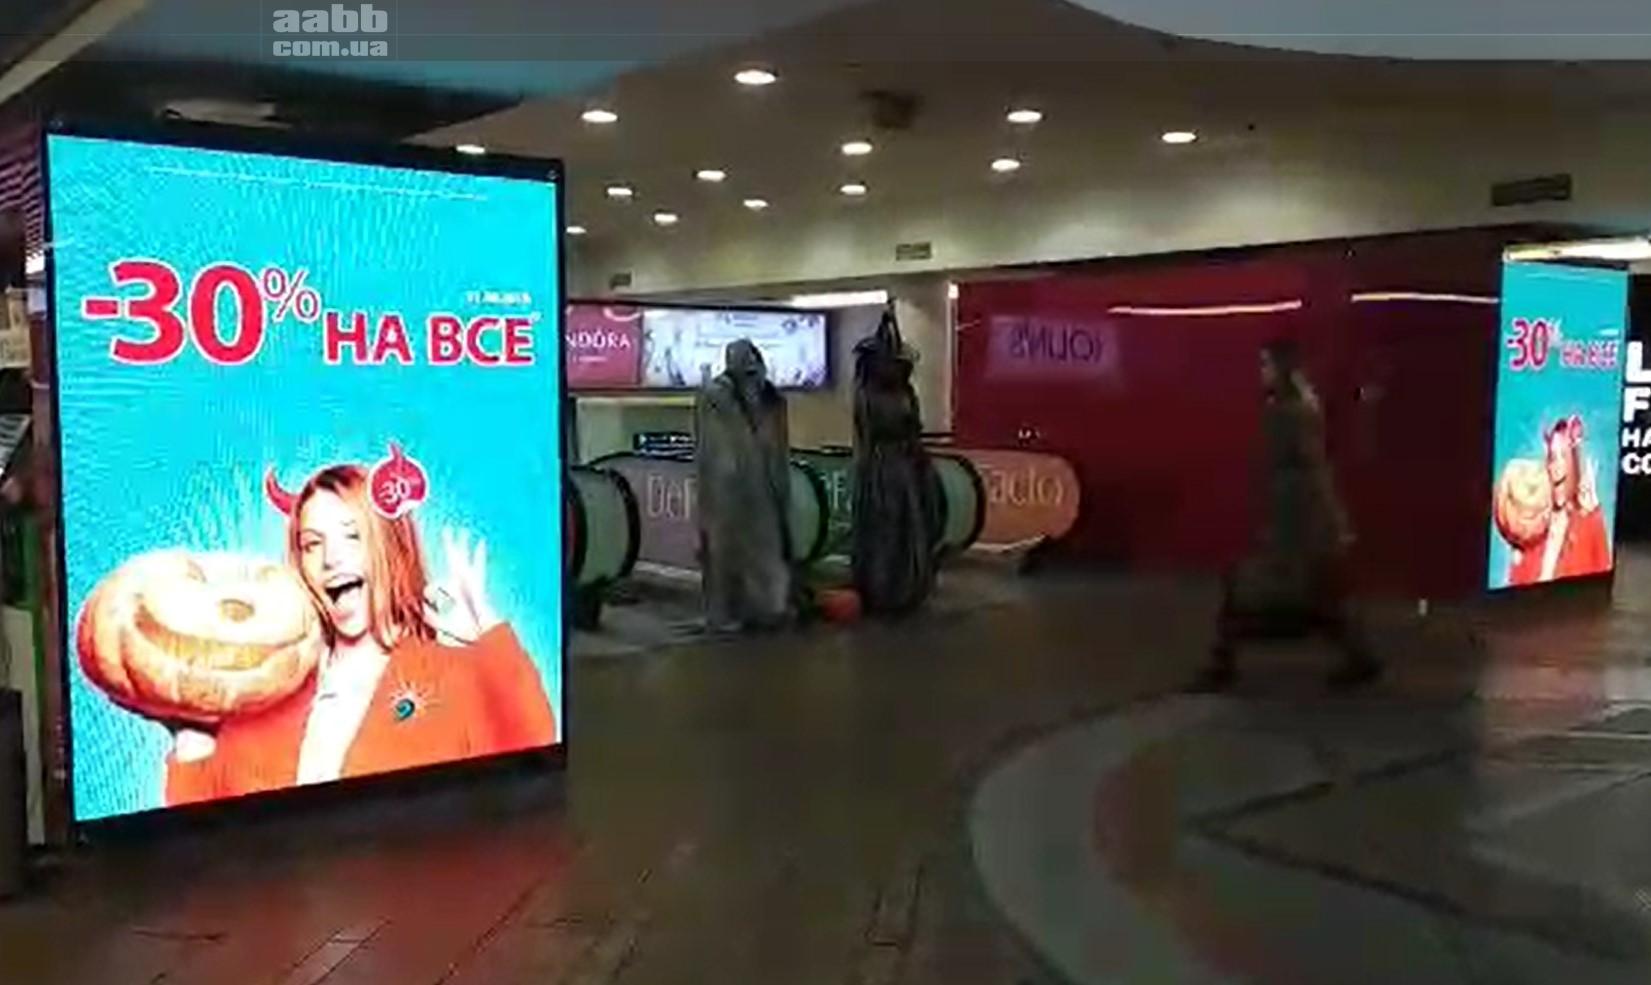 Реклама Brocard на видеоэкранах ТЦ Globus (ноябрь 2018)